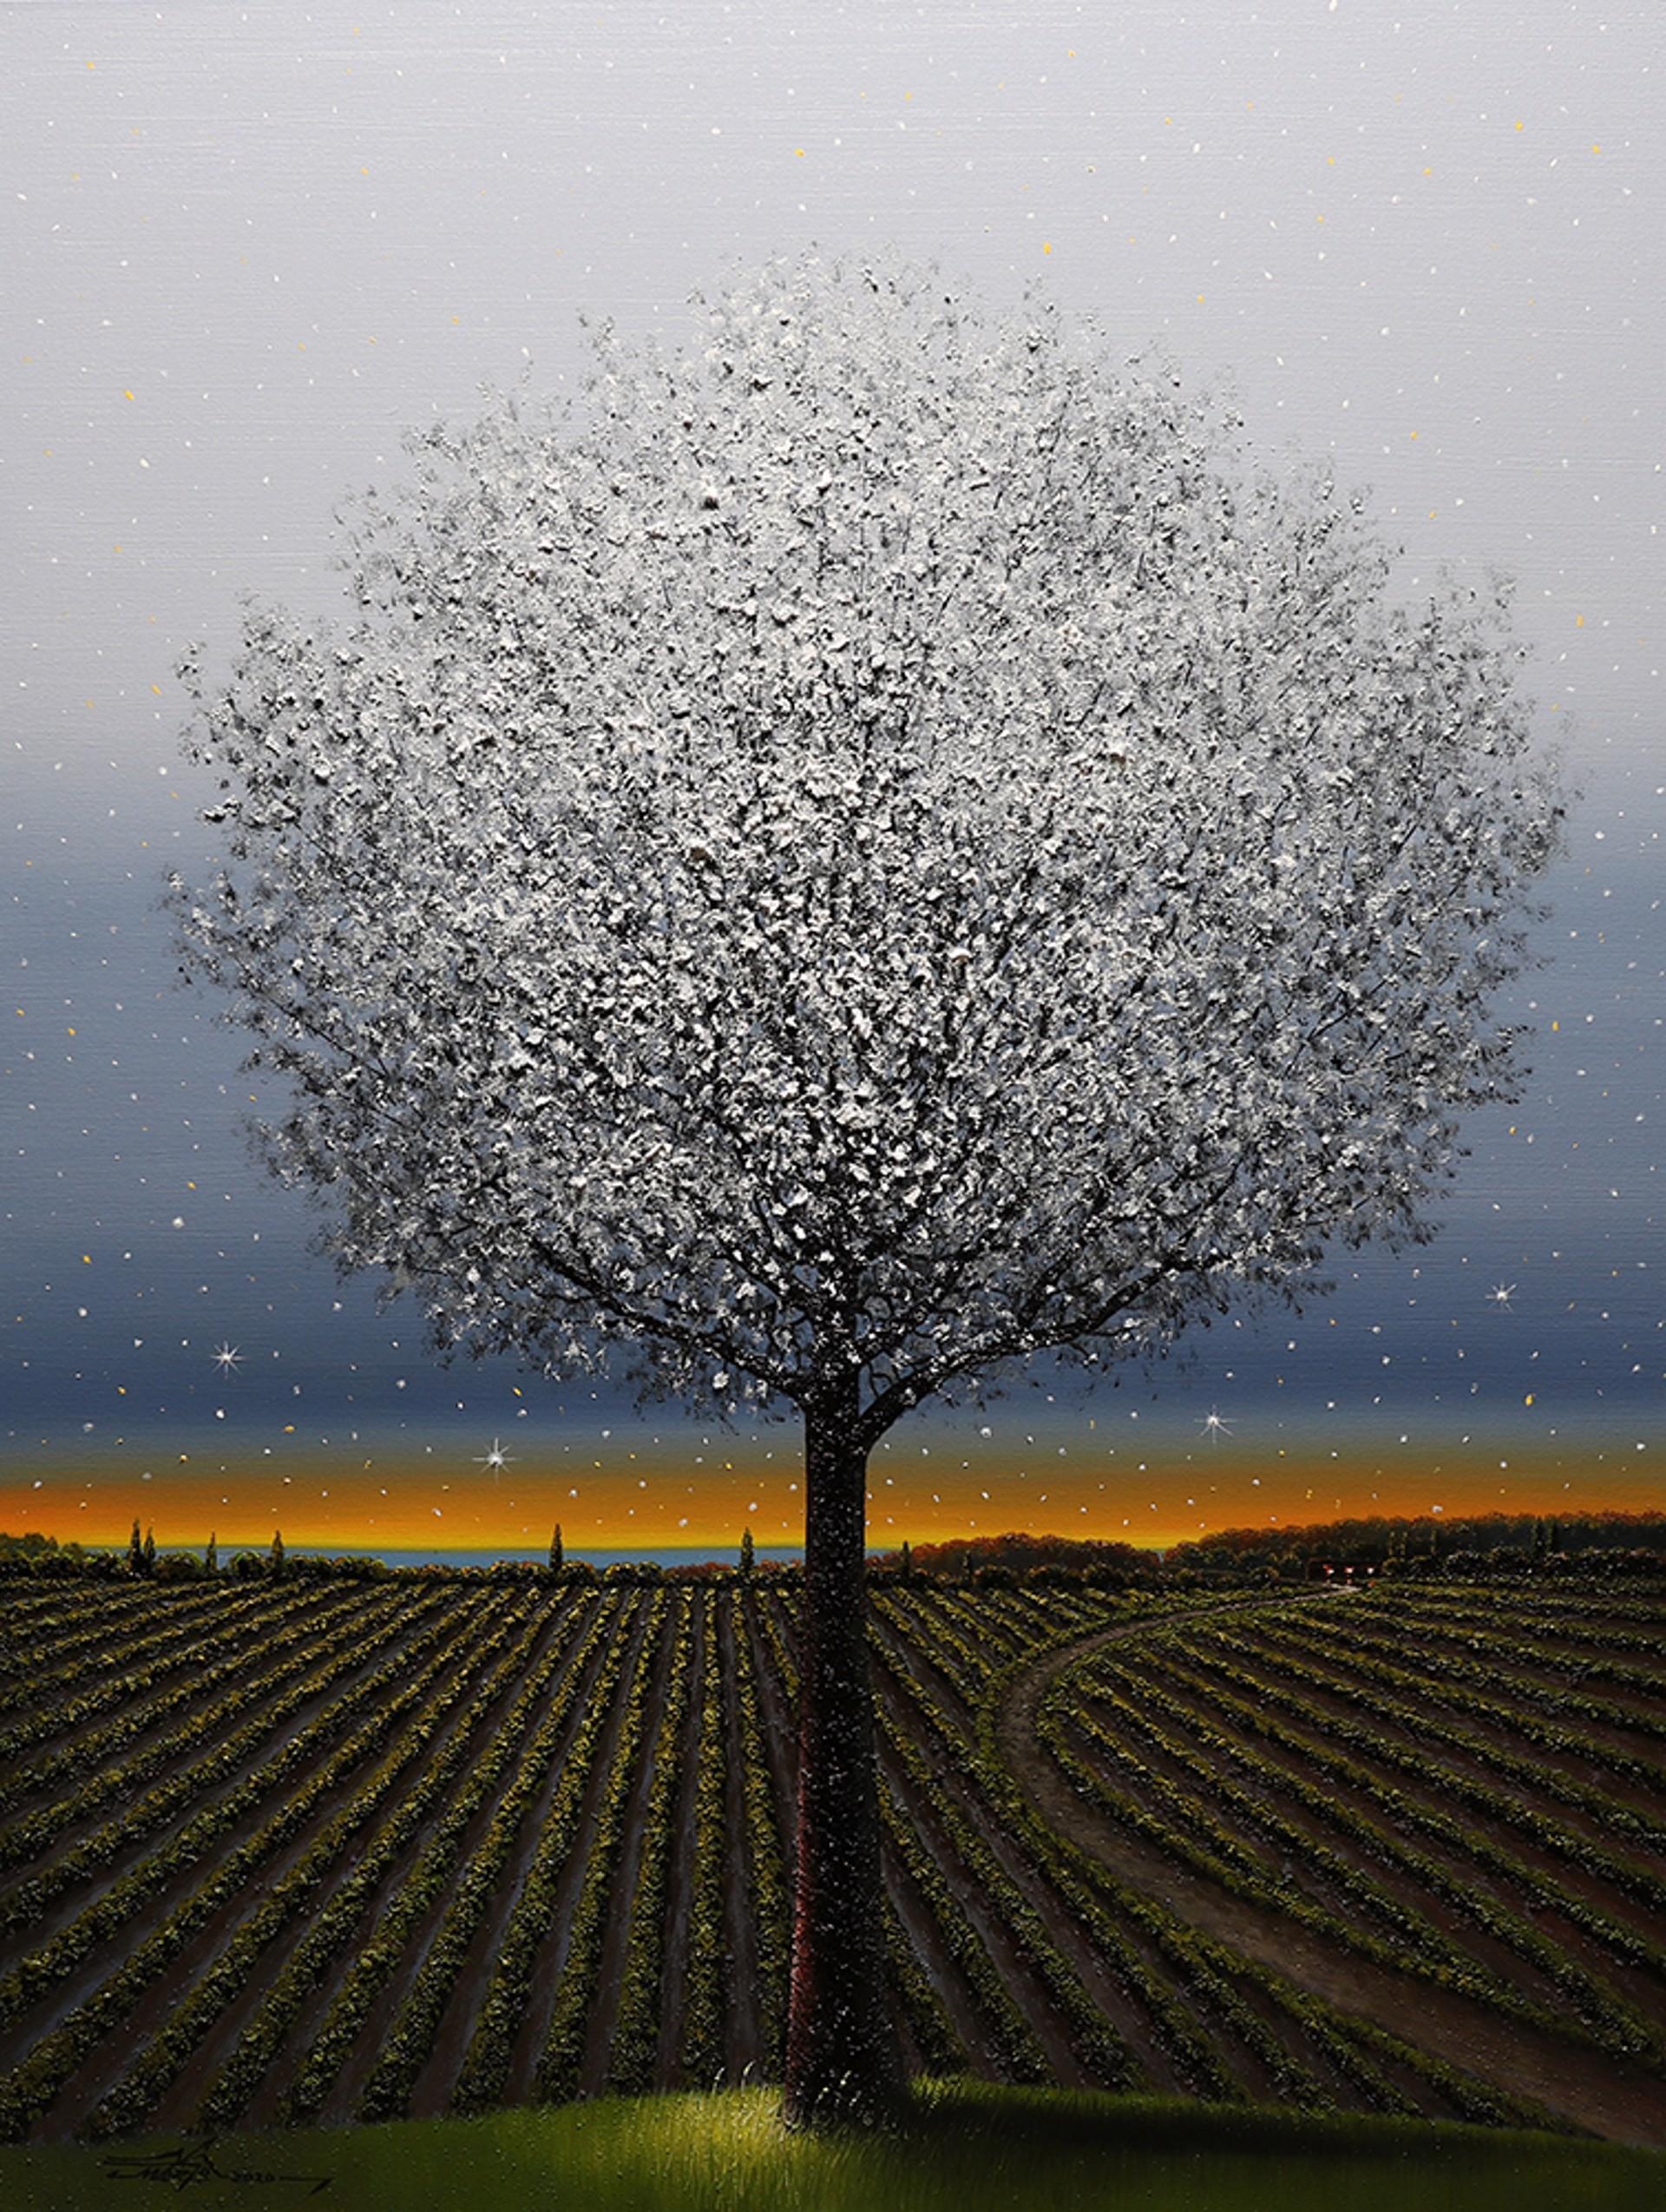 Twinkle Twinkle by Mario Jung